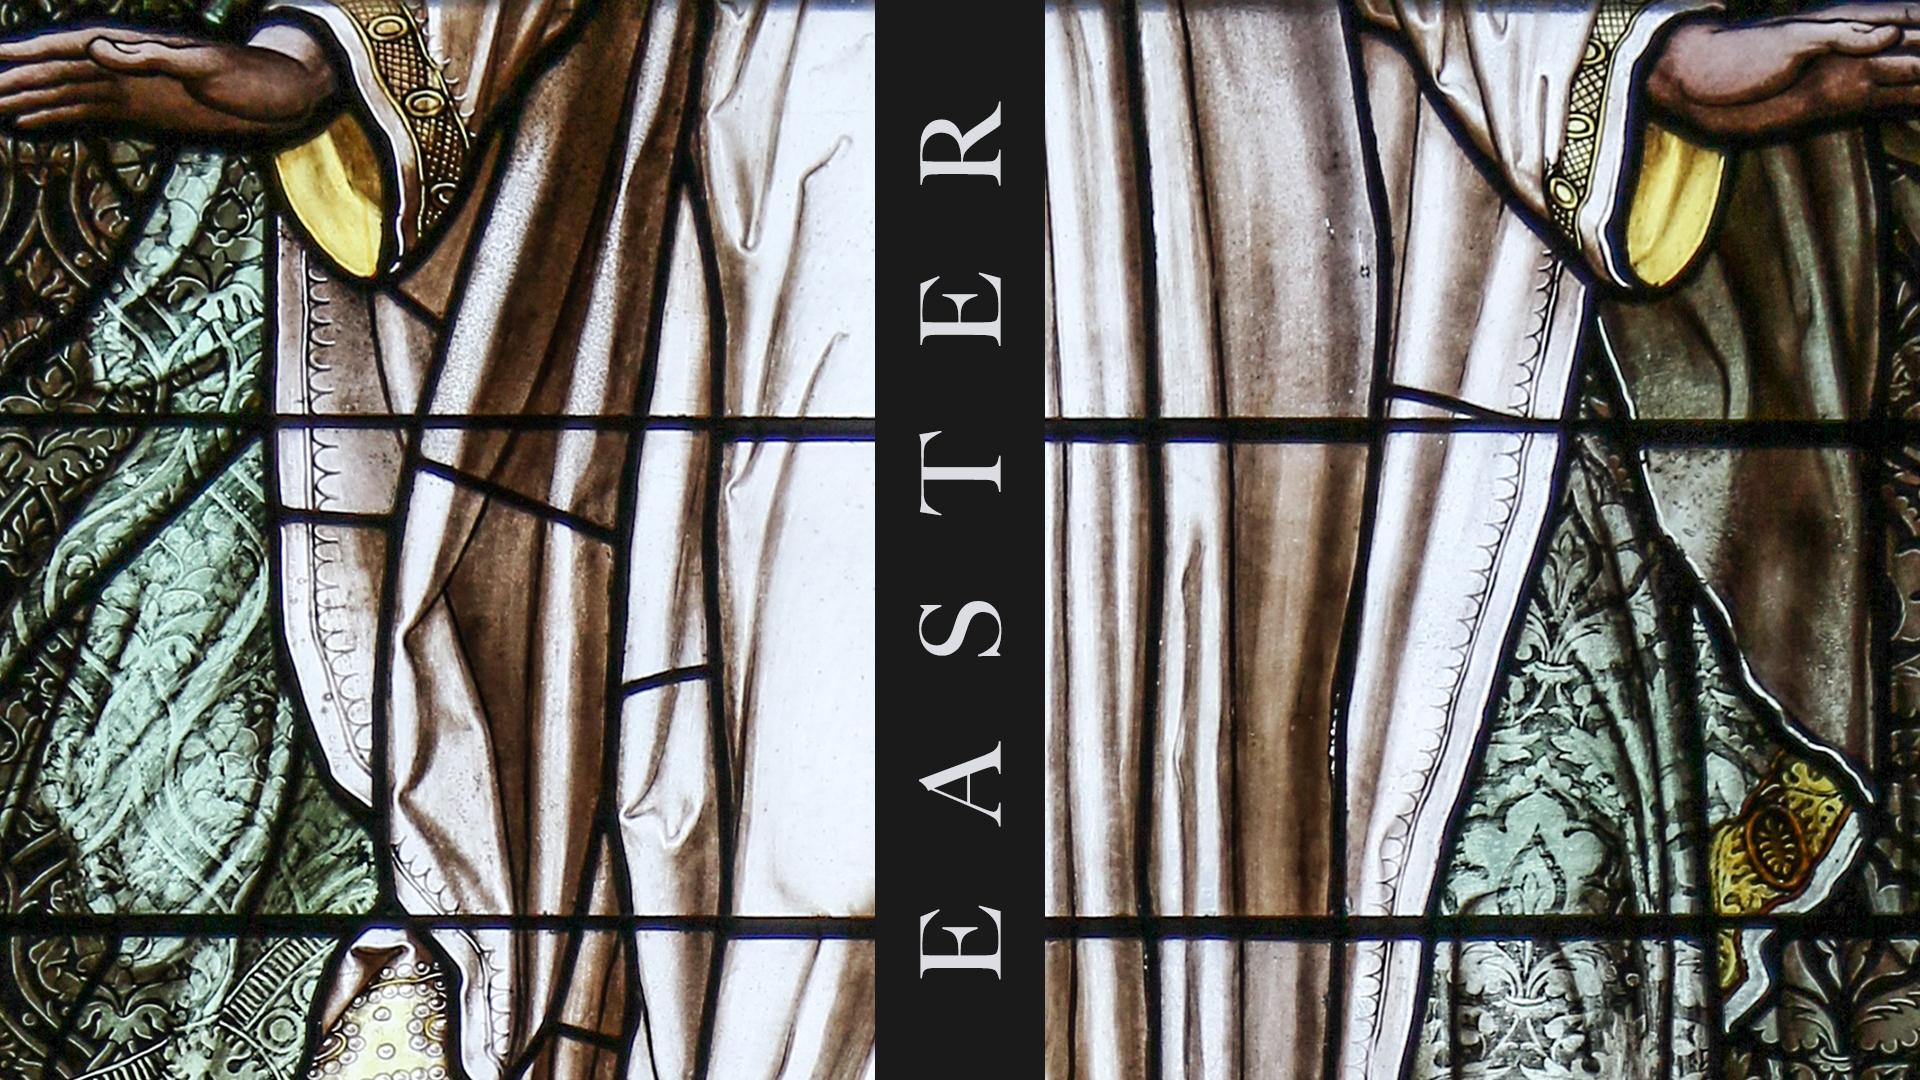 EasterStainedGlass4.jpg